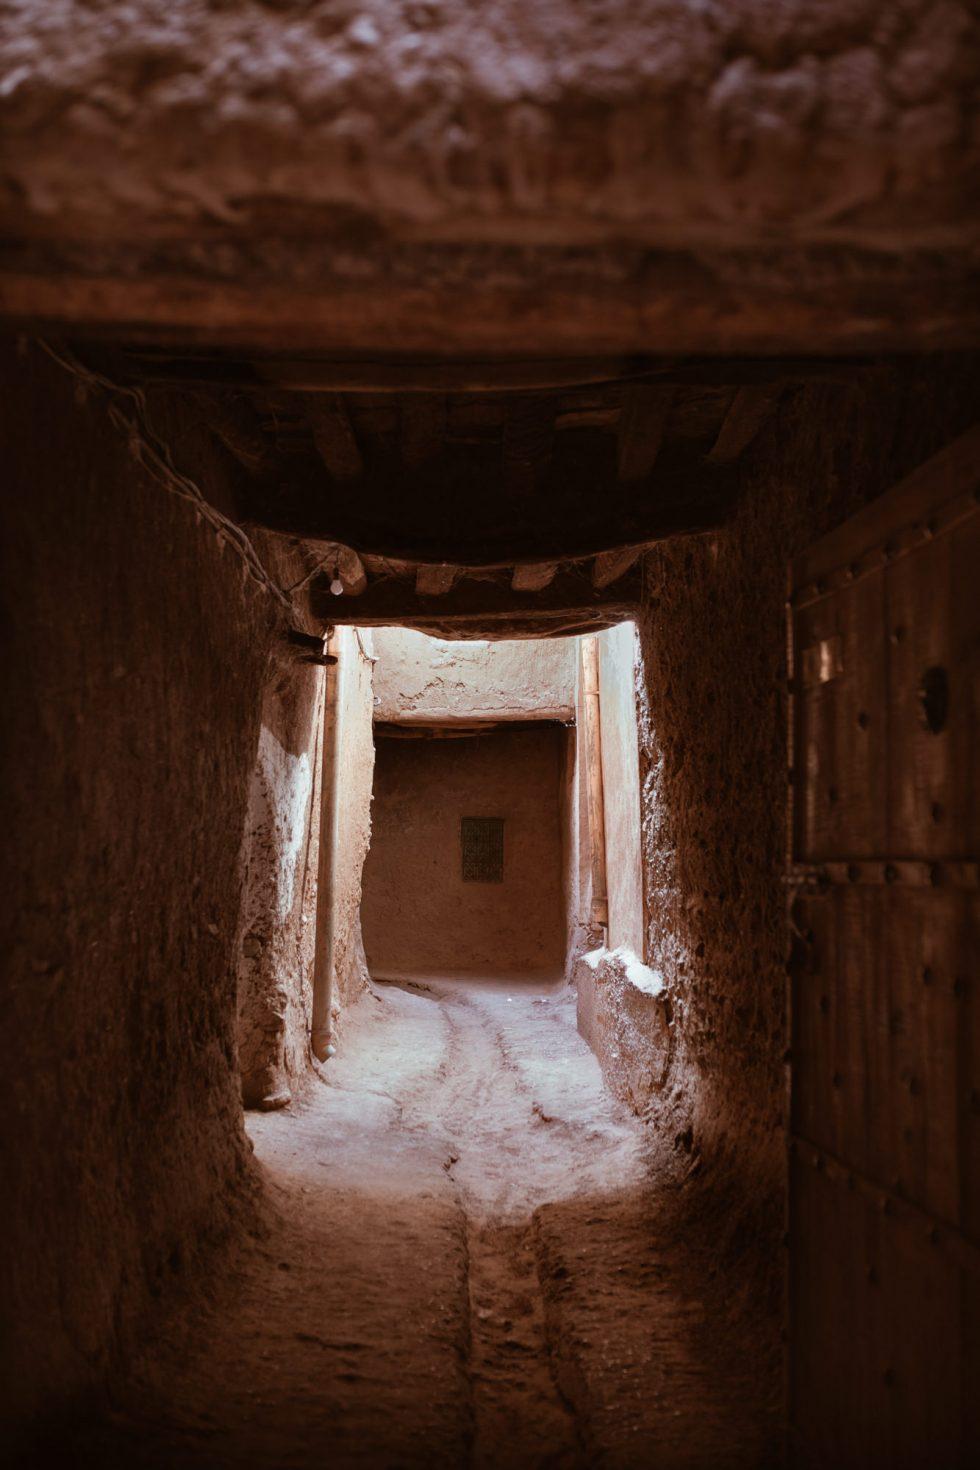 morocco-travel-lifestyle-photographer-laura-g-diaz-5